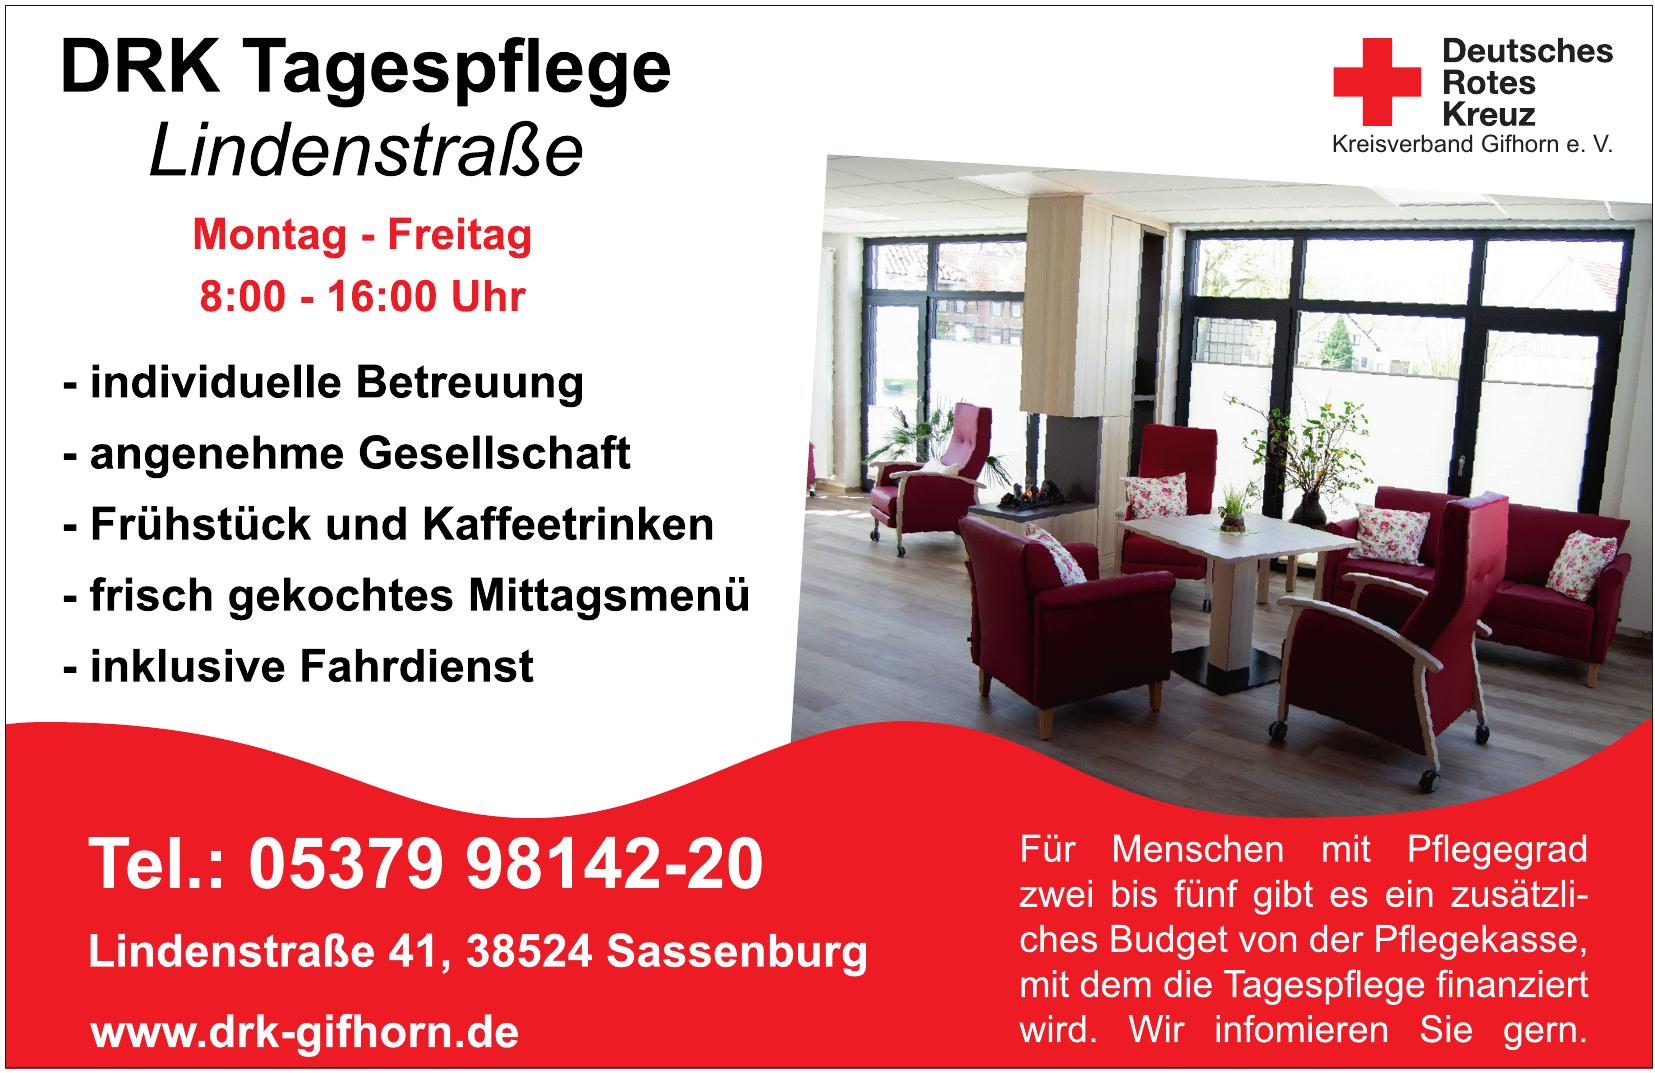 Deutsches Rotes Kreuz Kreisverband Gifhorn e. V.